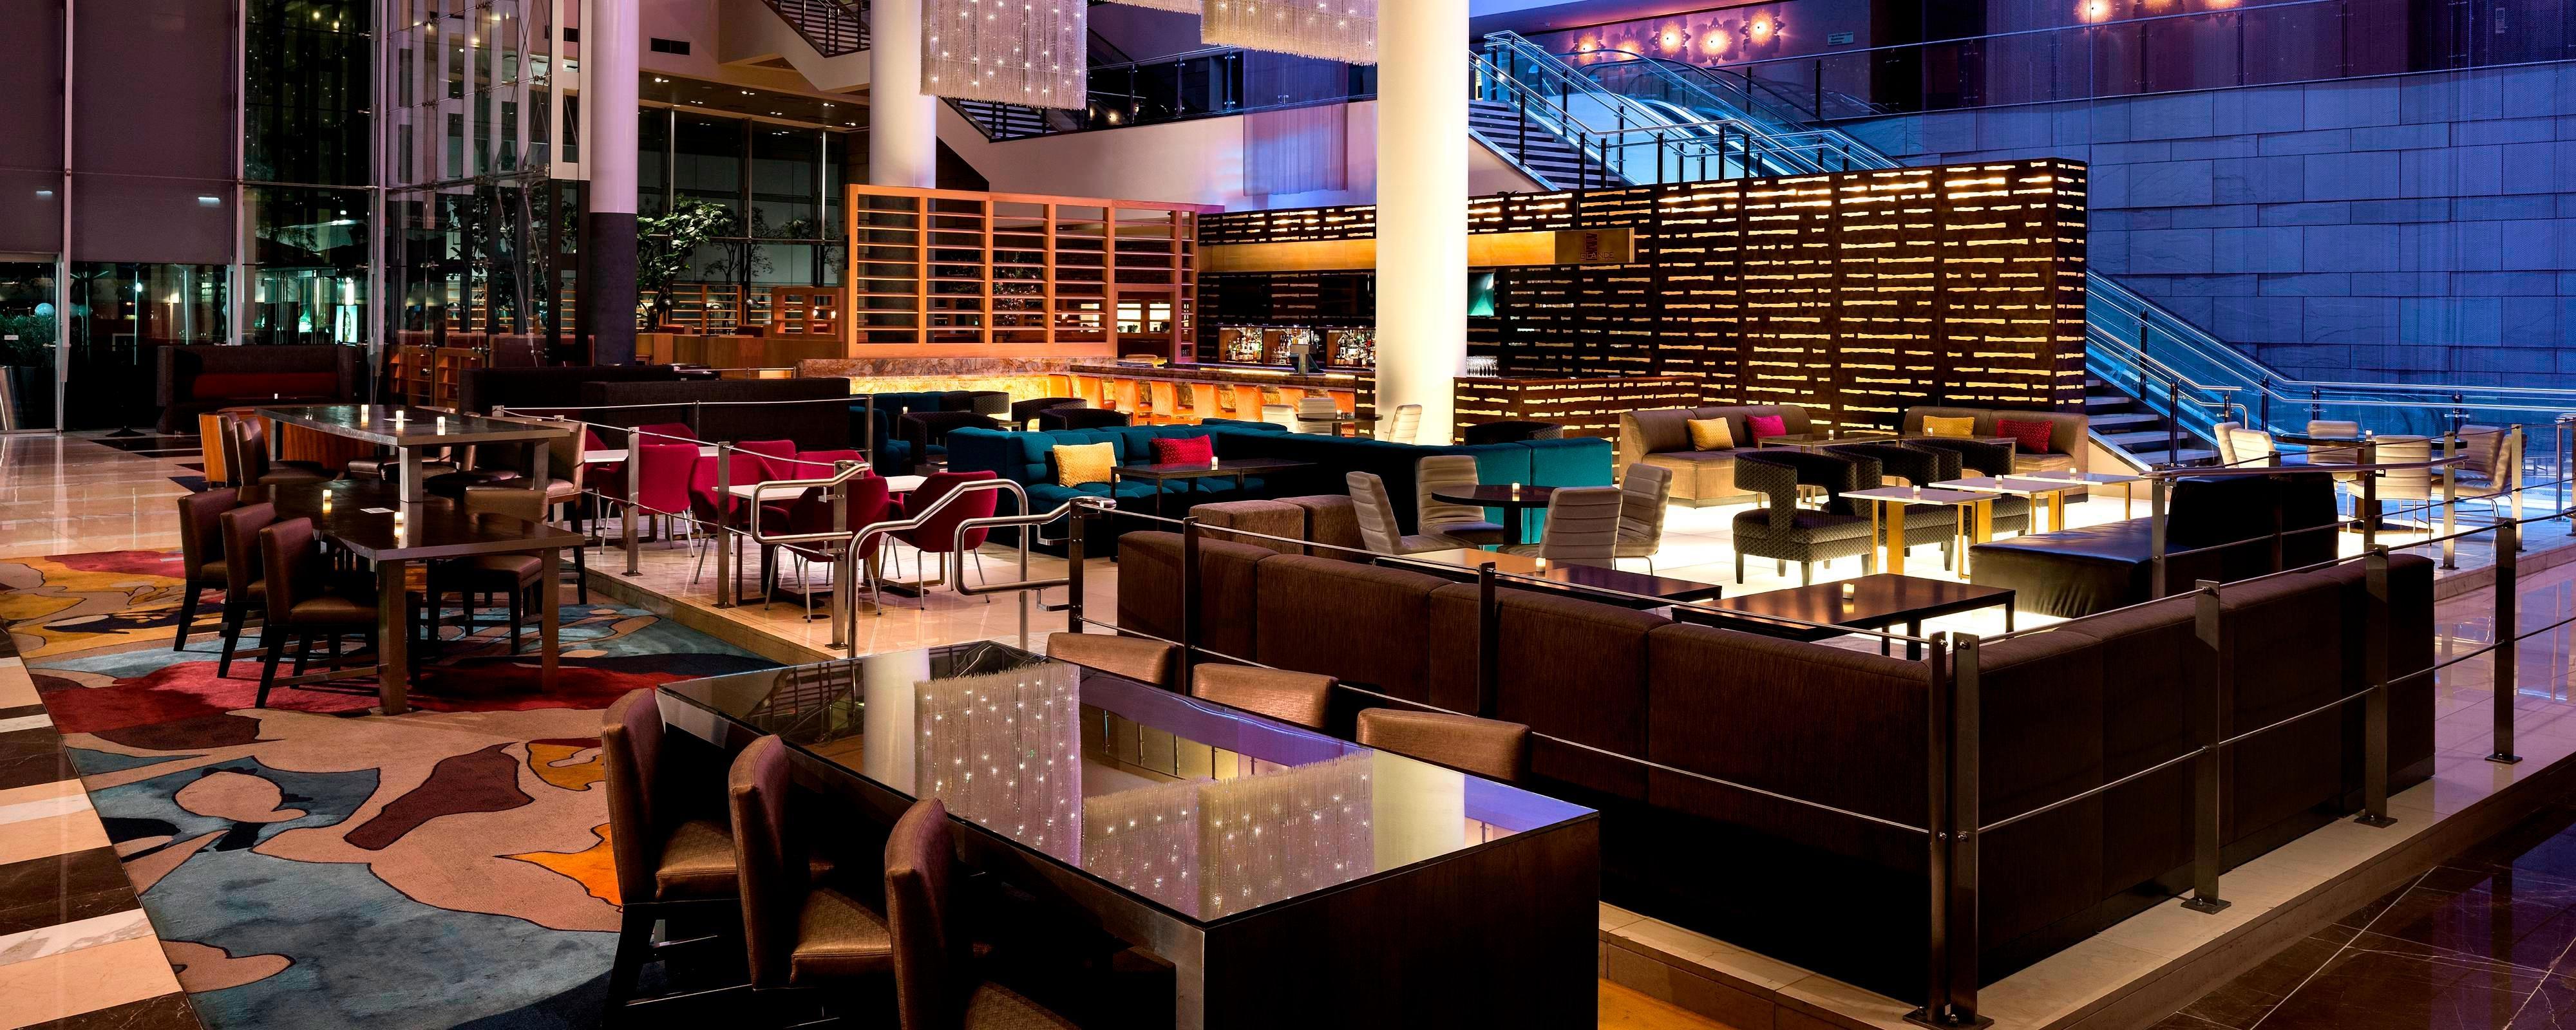 L A Live Restaurants Los Angeles Dining Jw Marriott